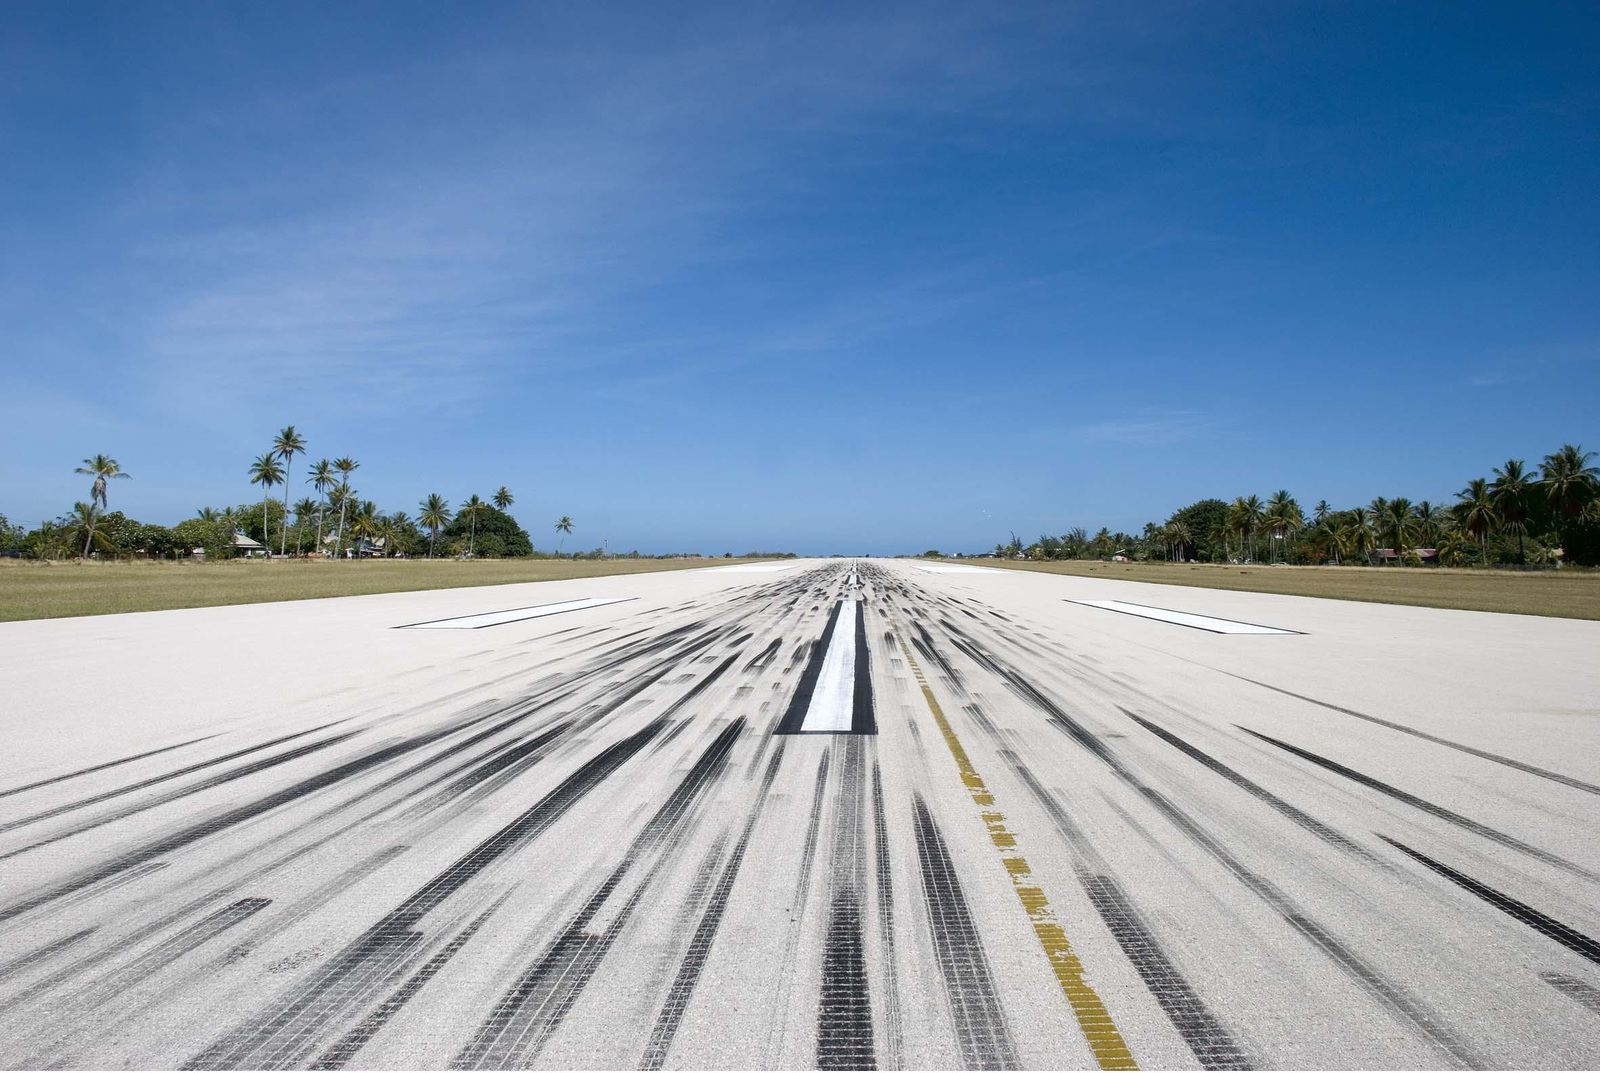 Nauru International Airport Tarmac image